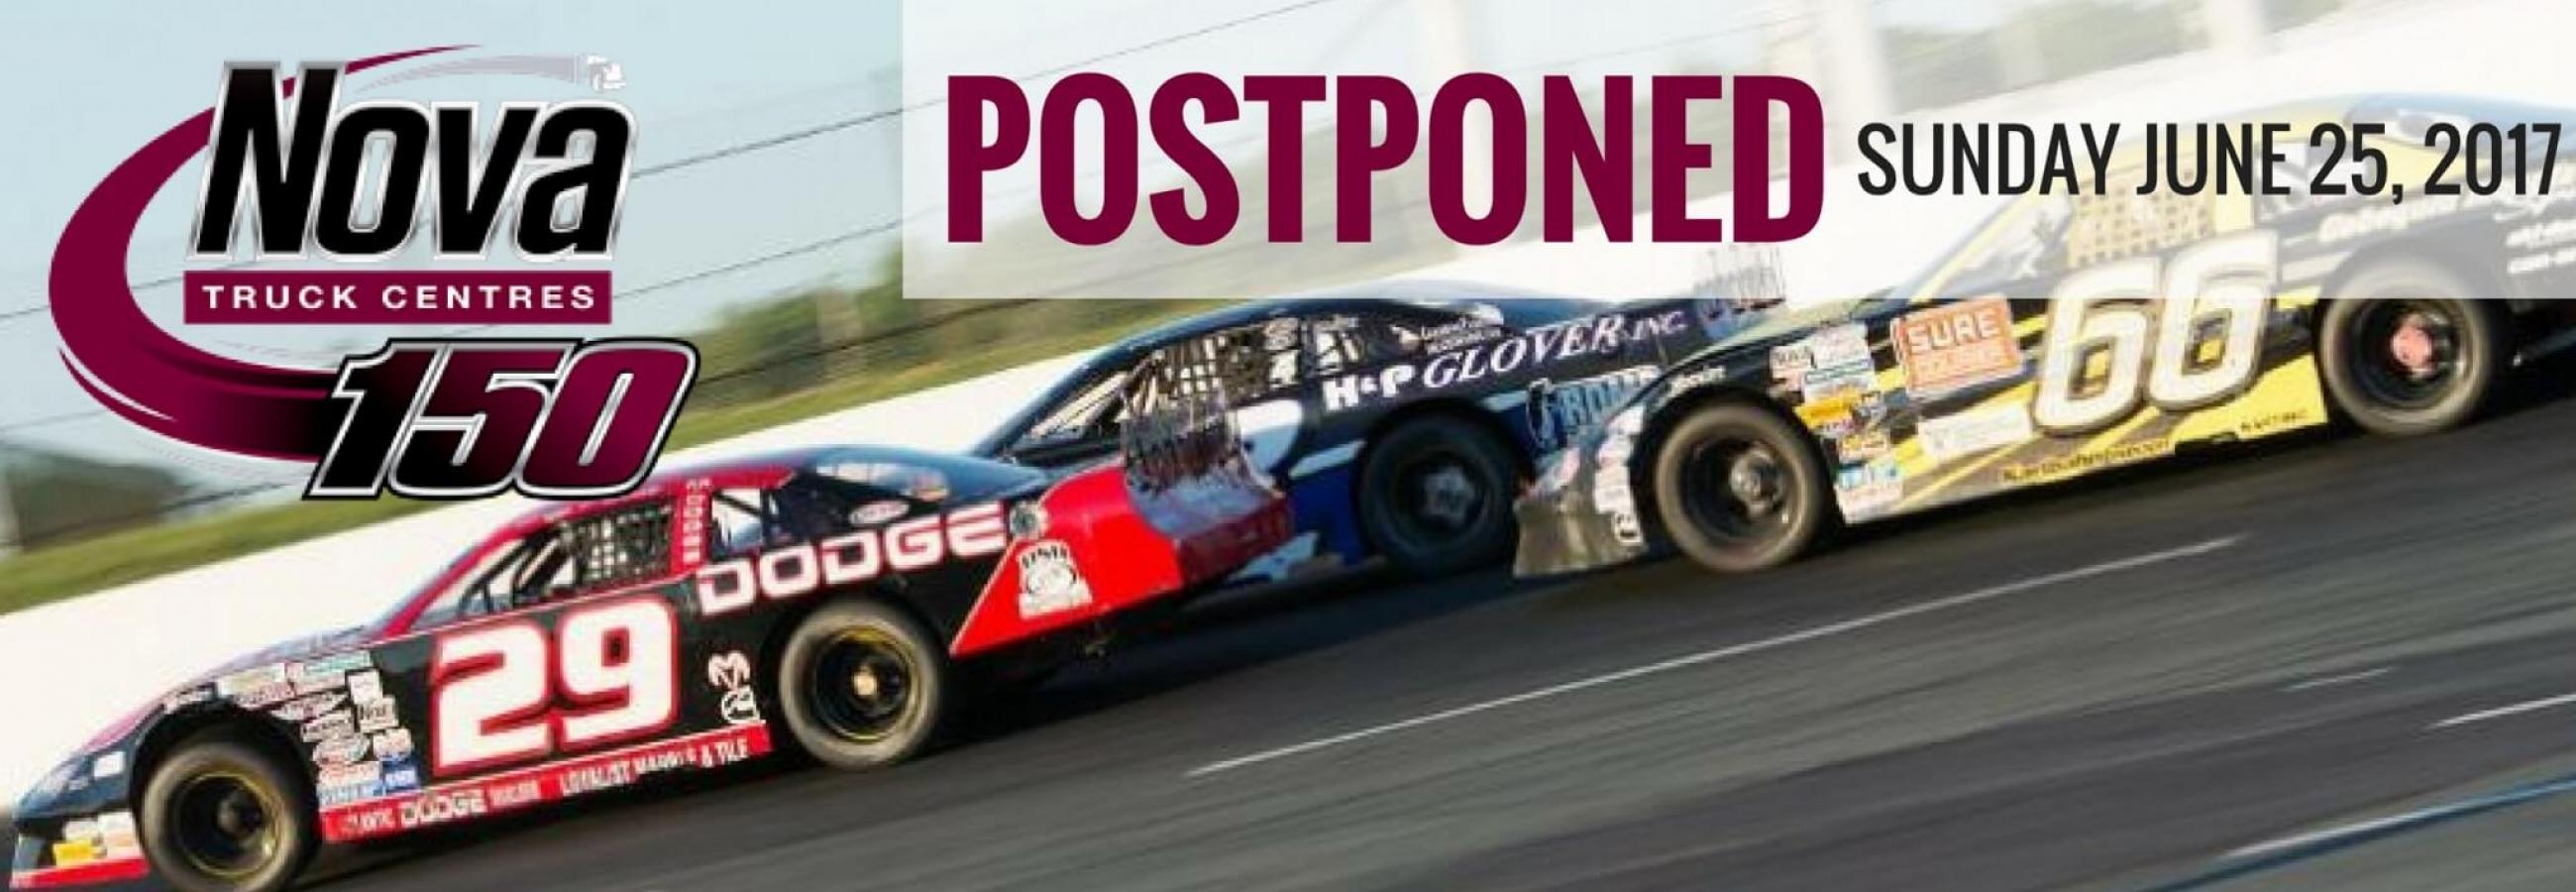 ntc postponed